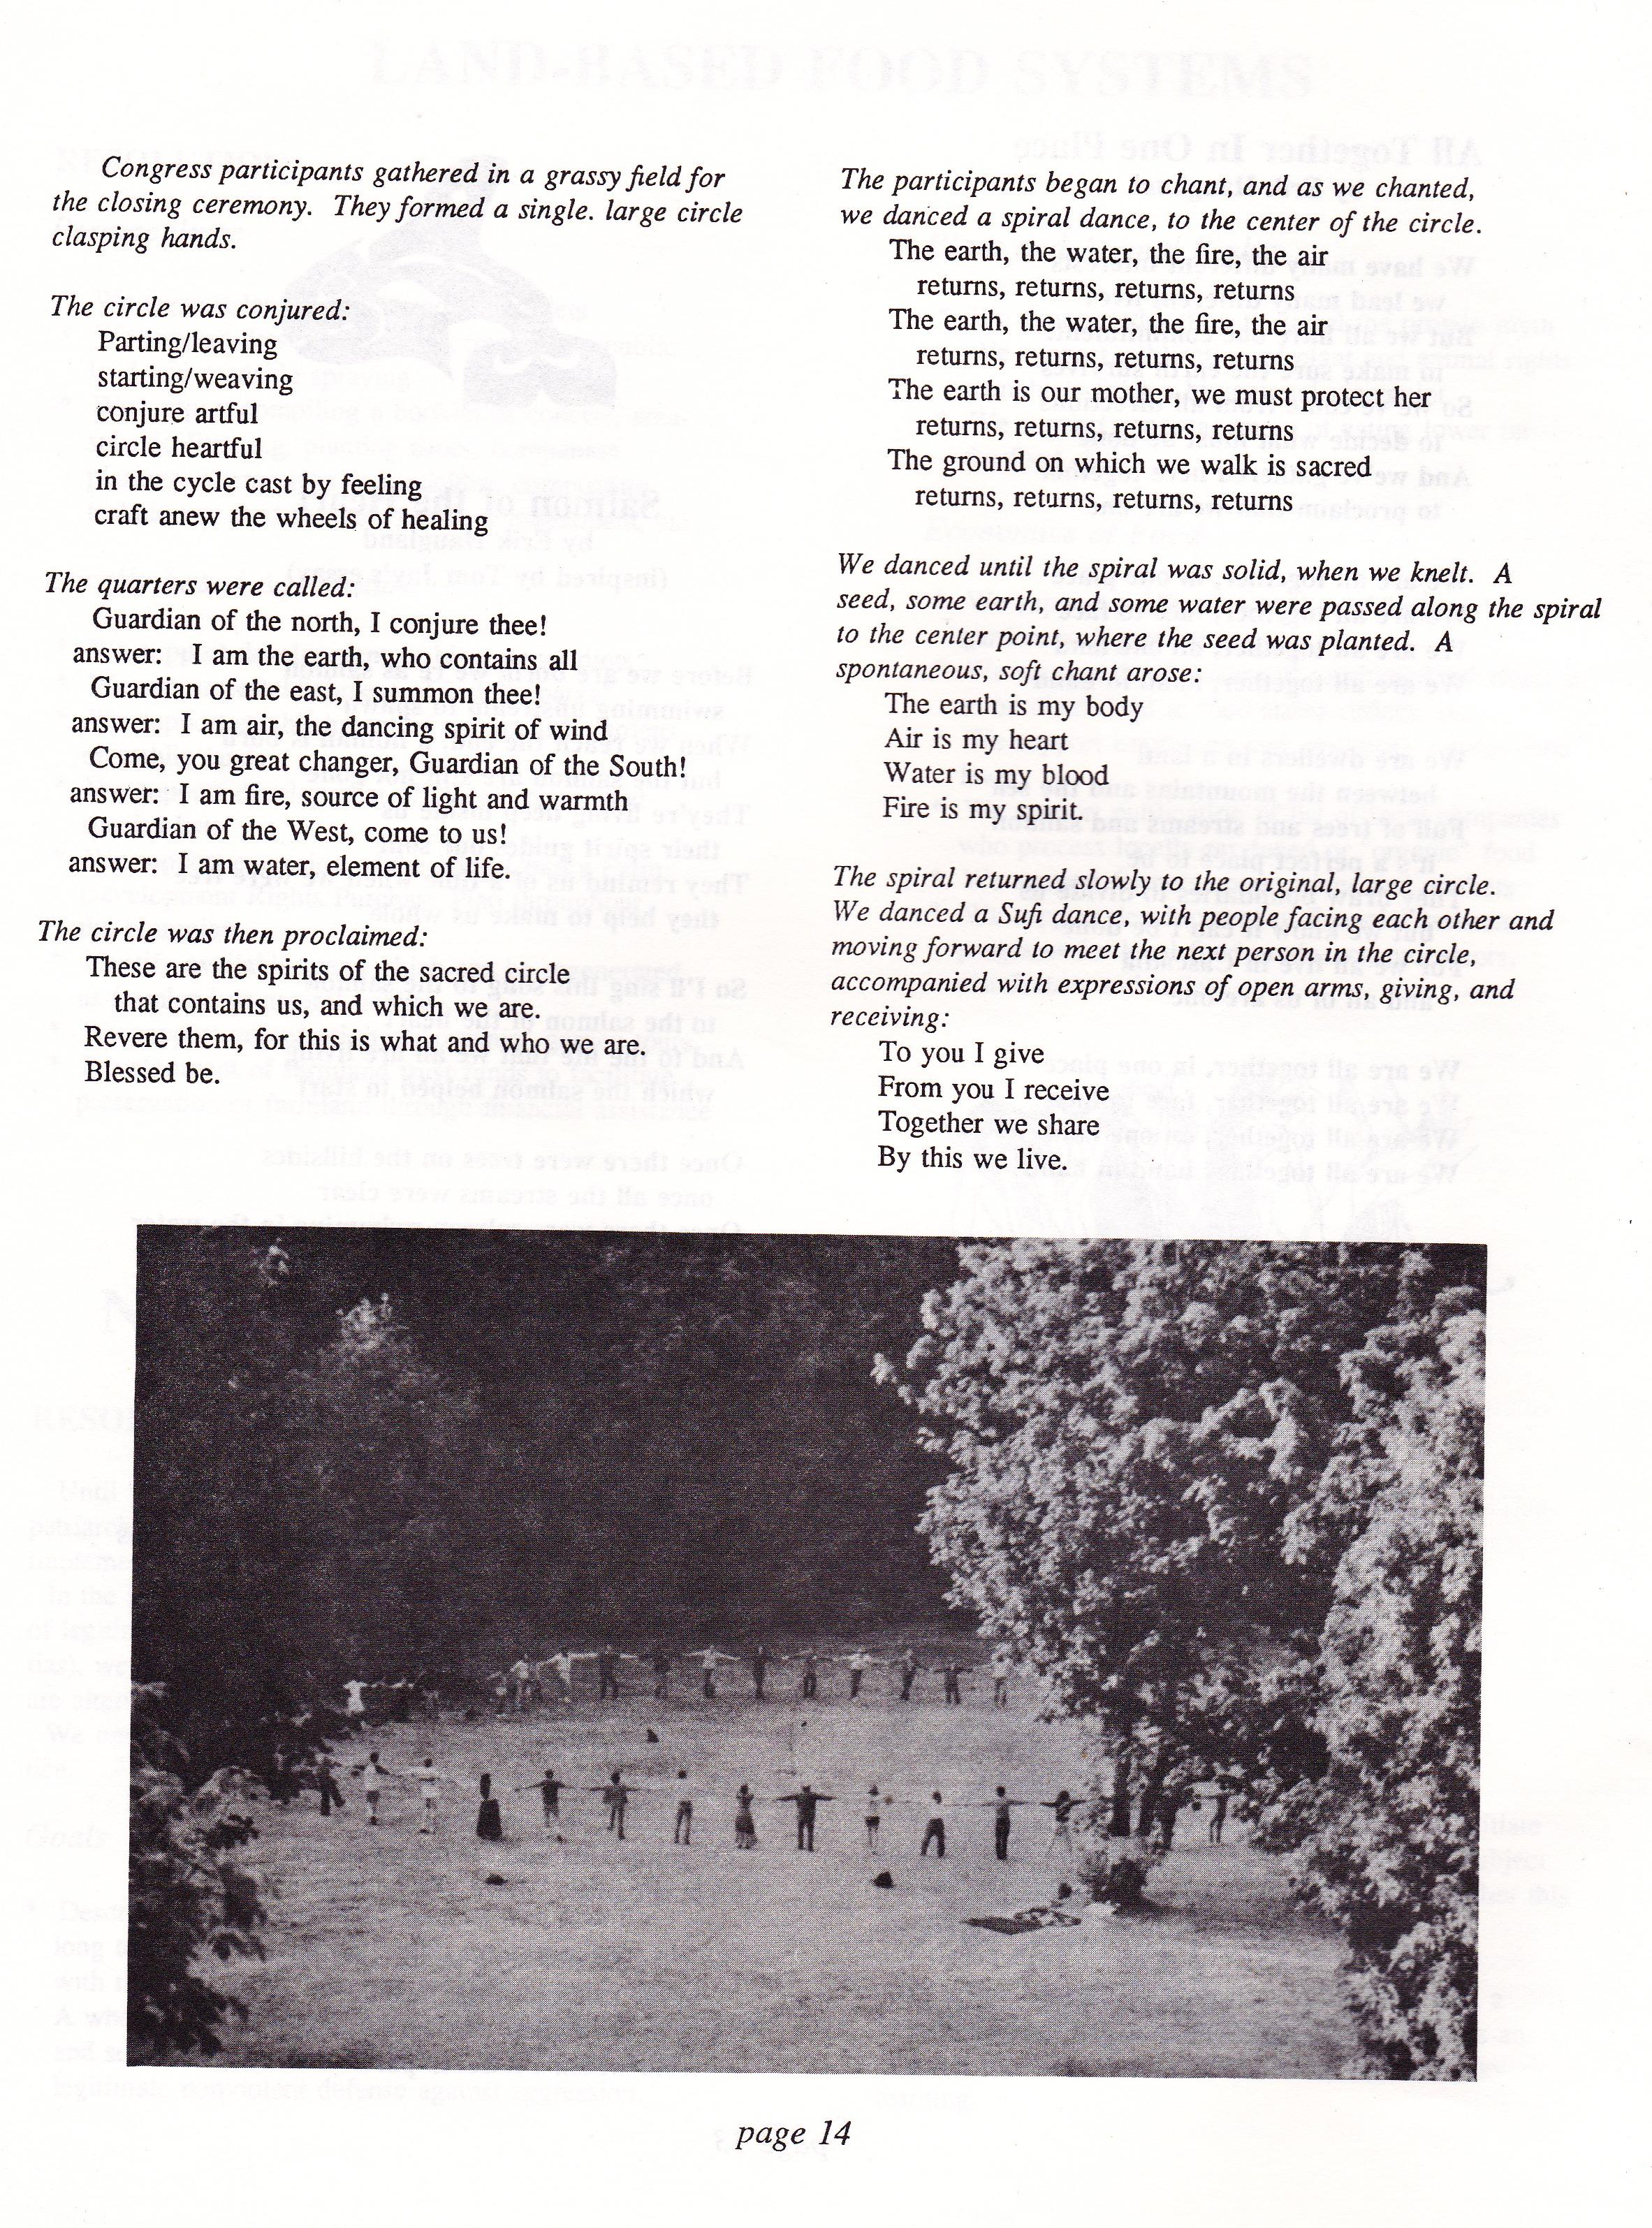 Cascadia Bioregional Congress 1986 Proceedings_0012.jpg